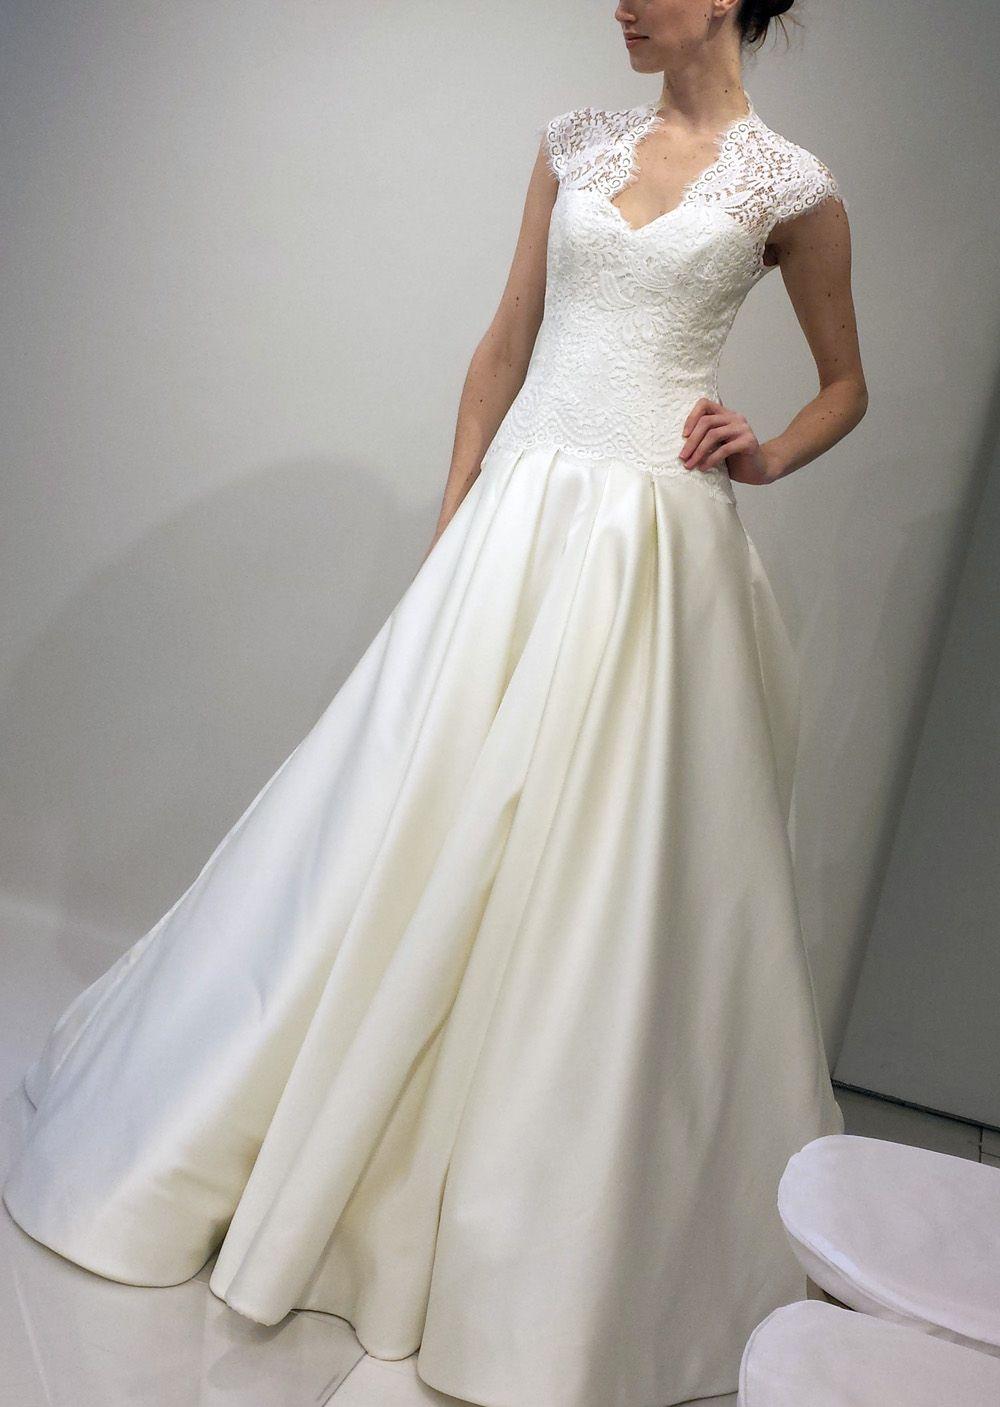 Utah Wedding Dresses, Modest Wedding Dresses   Alta Moda Bridal ...